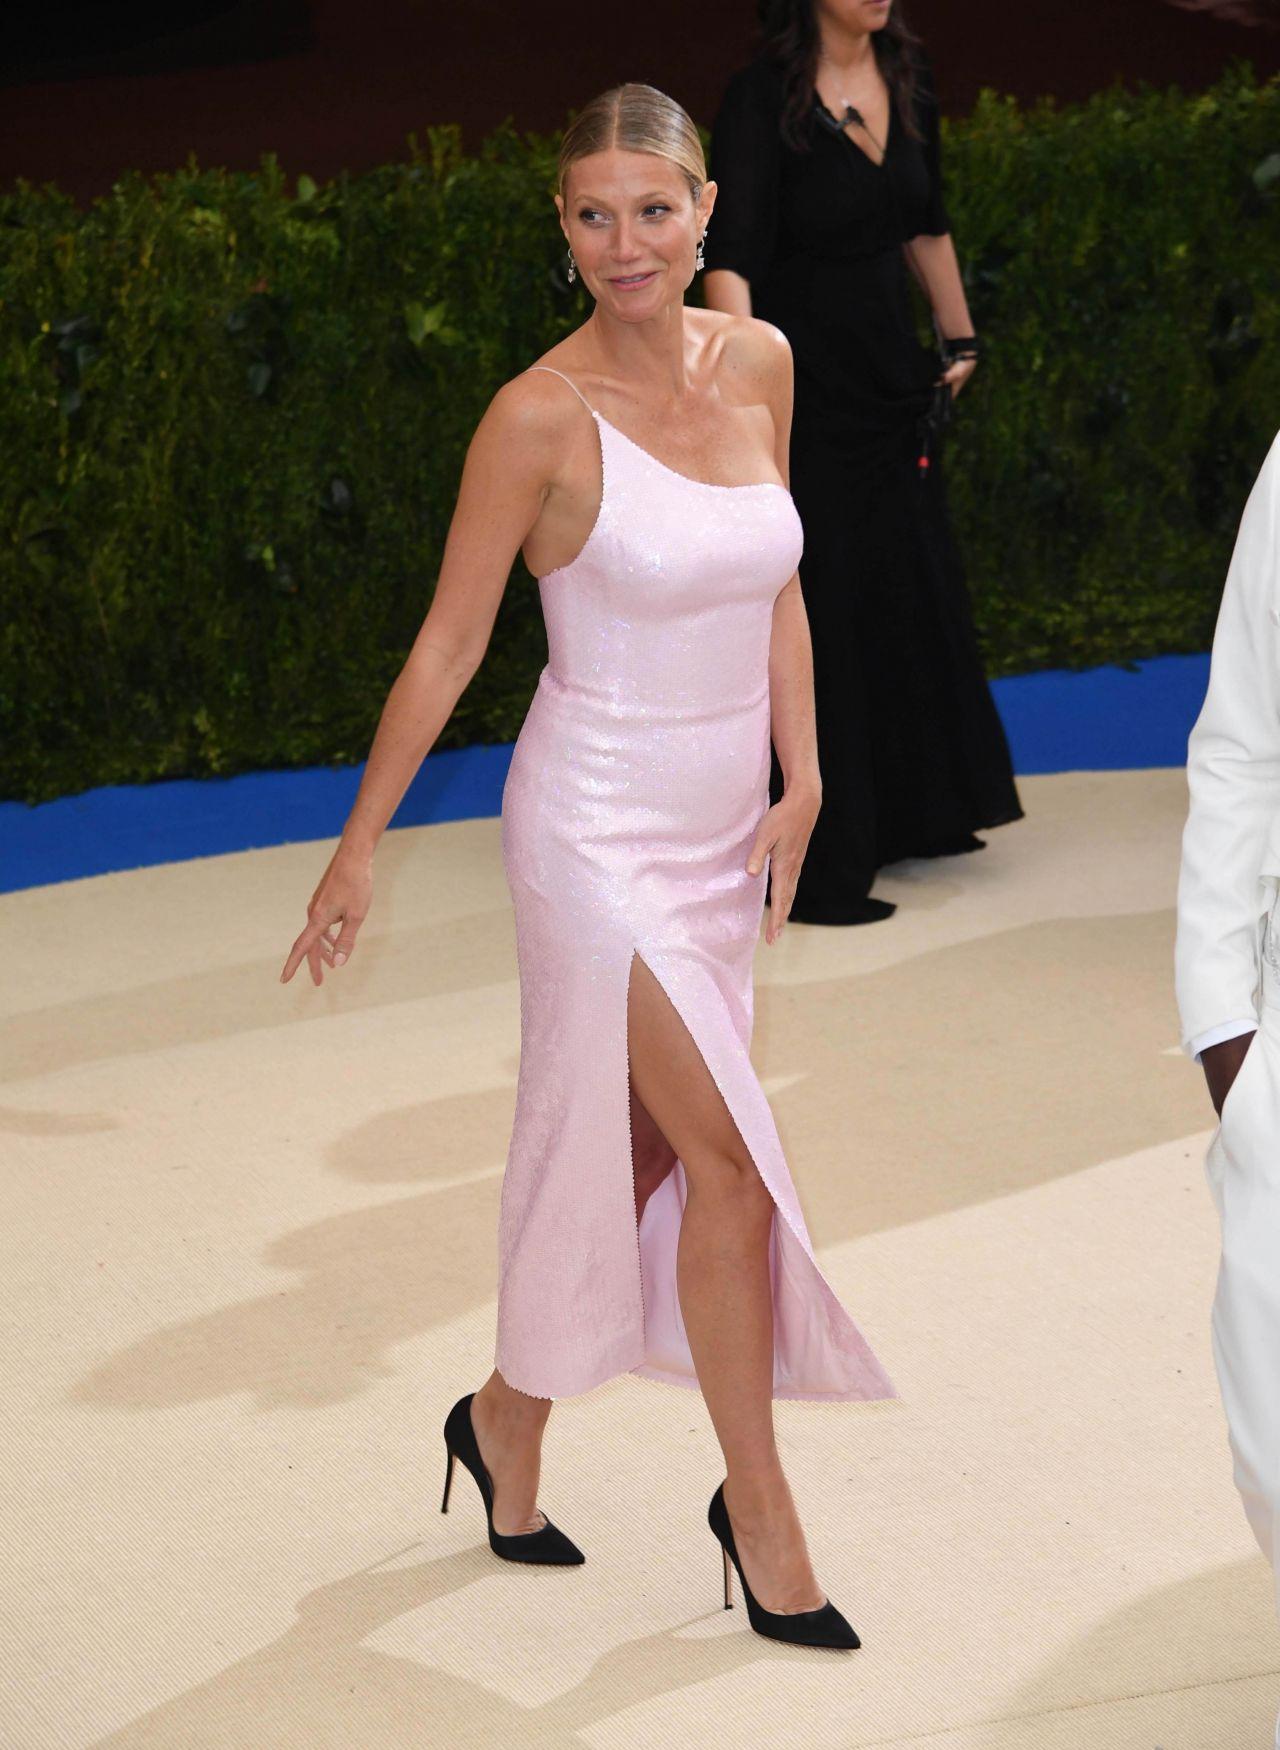 Gwyneth Paltrow At Met Gala In New York 05 01 2017